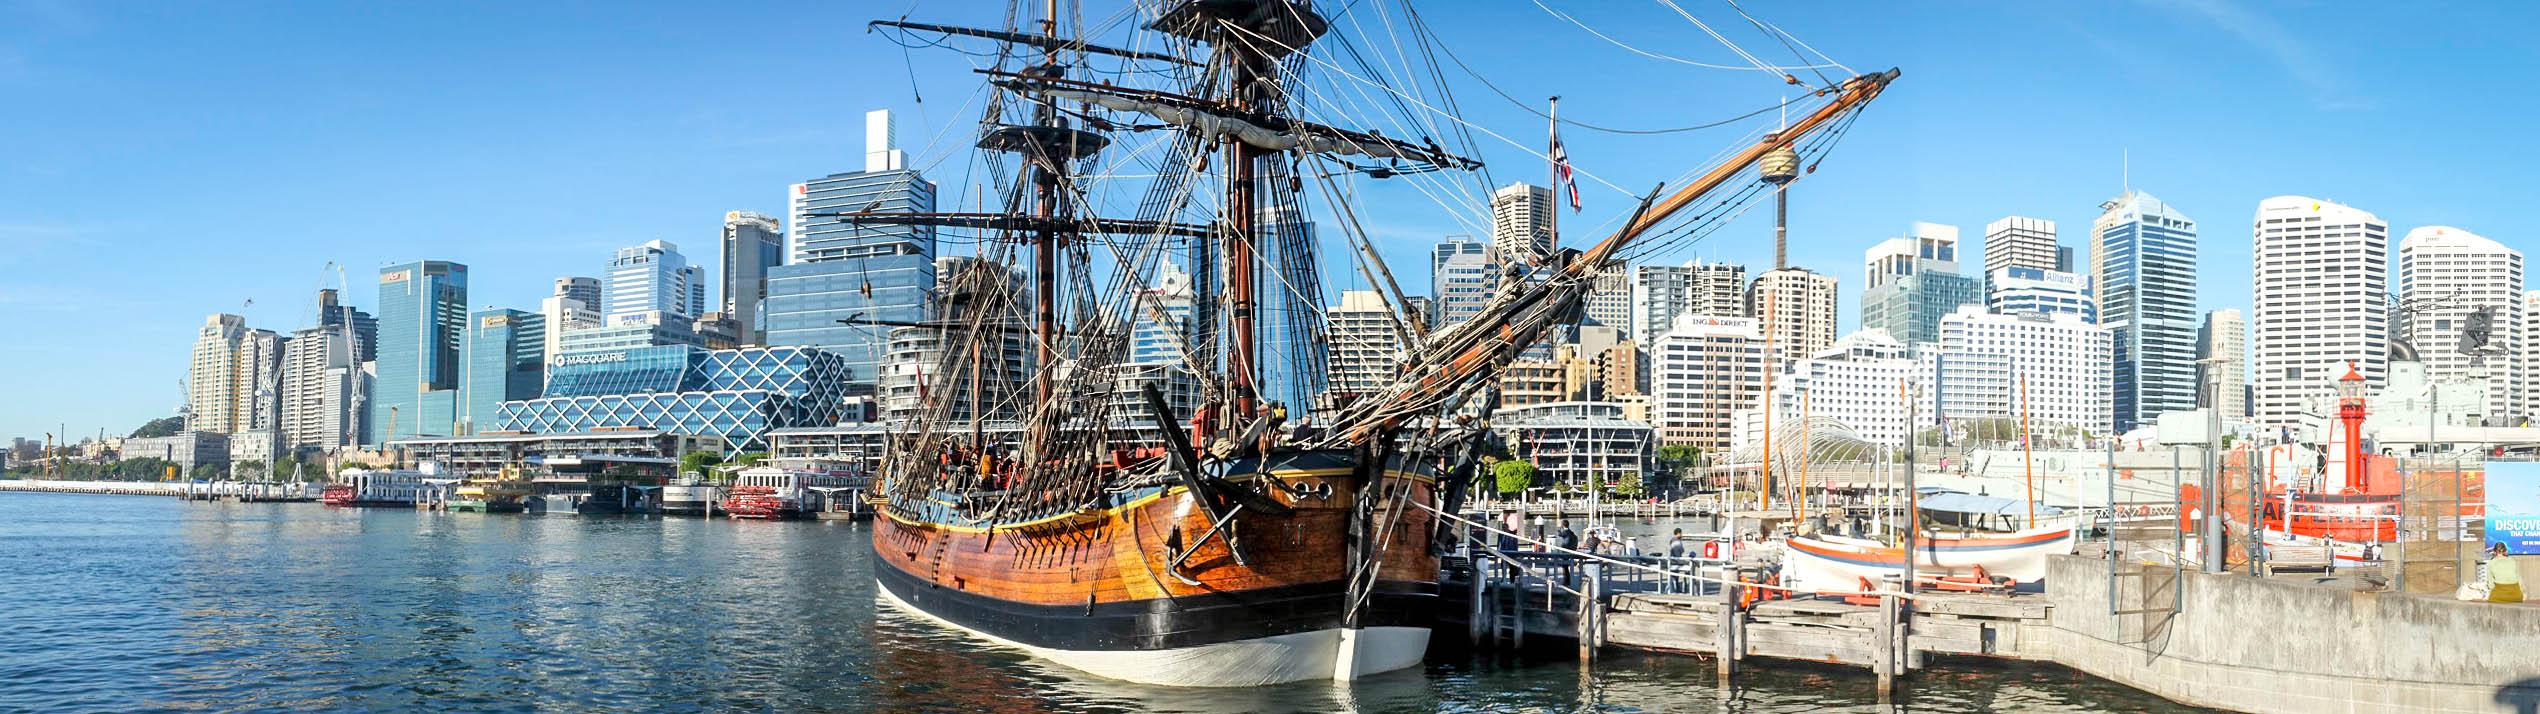 HM Bark Endeavour replica in Sydney Harbour